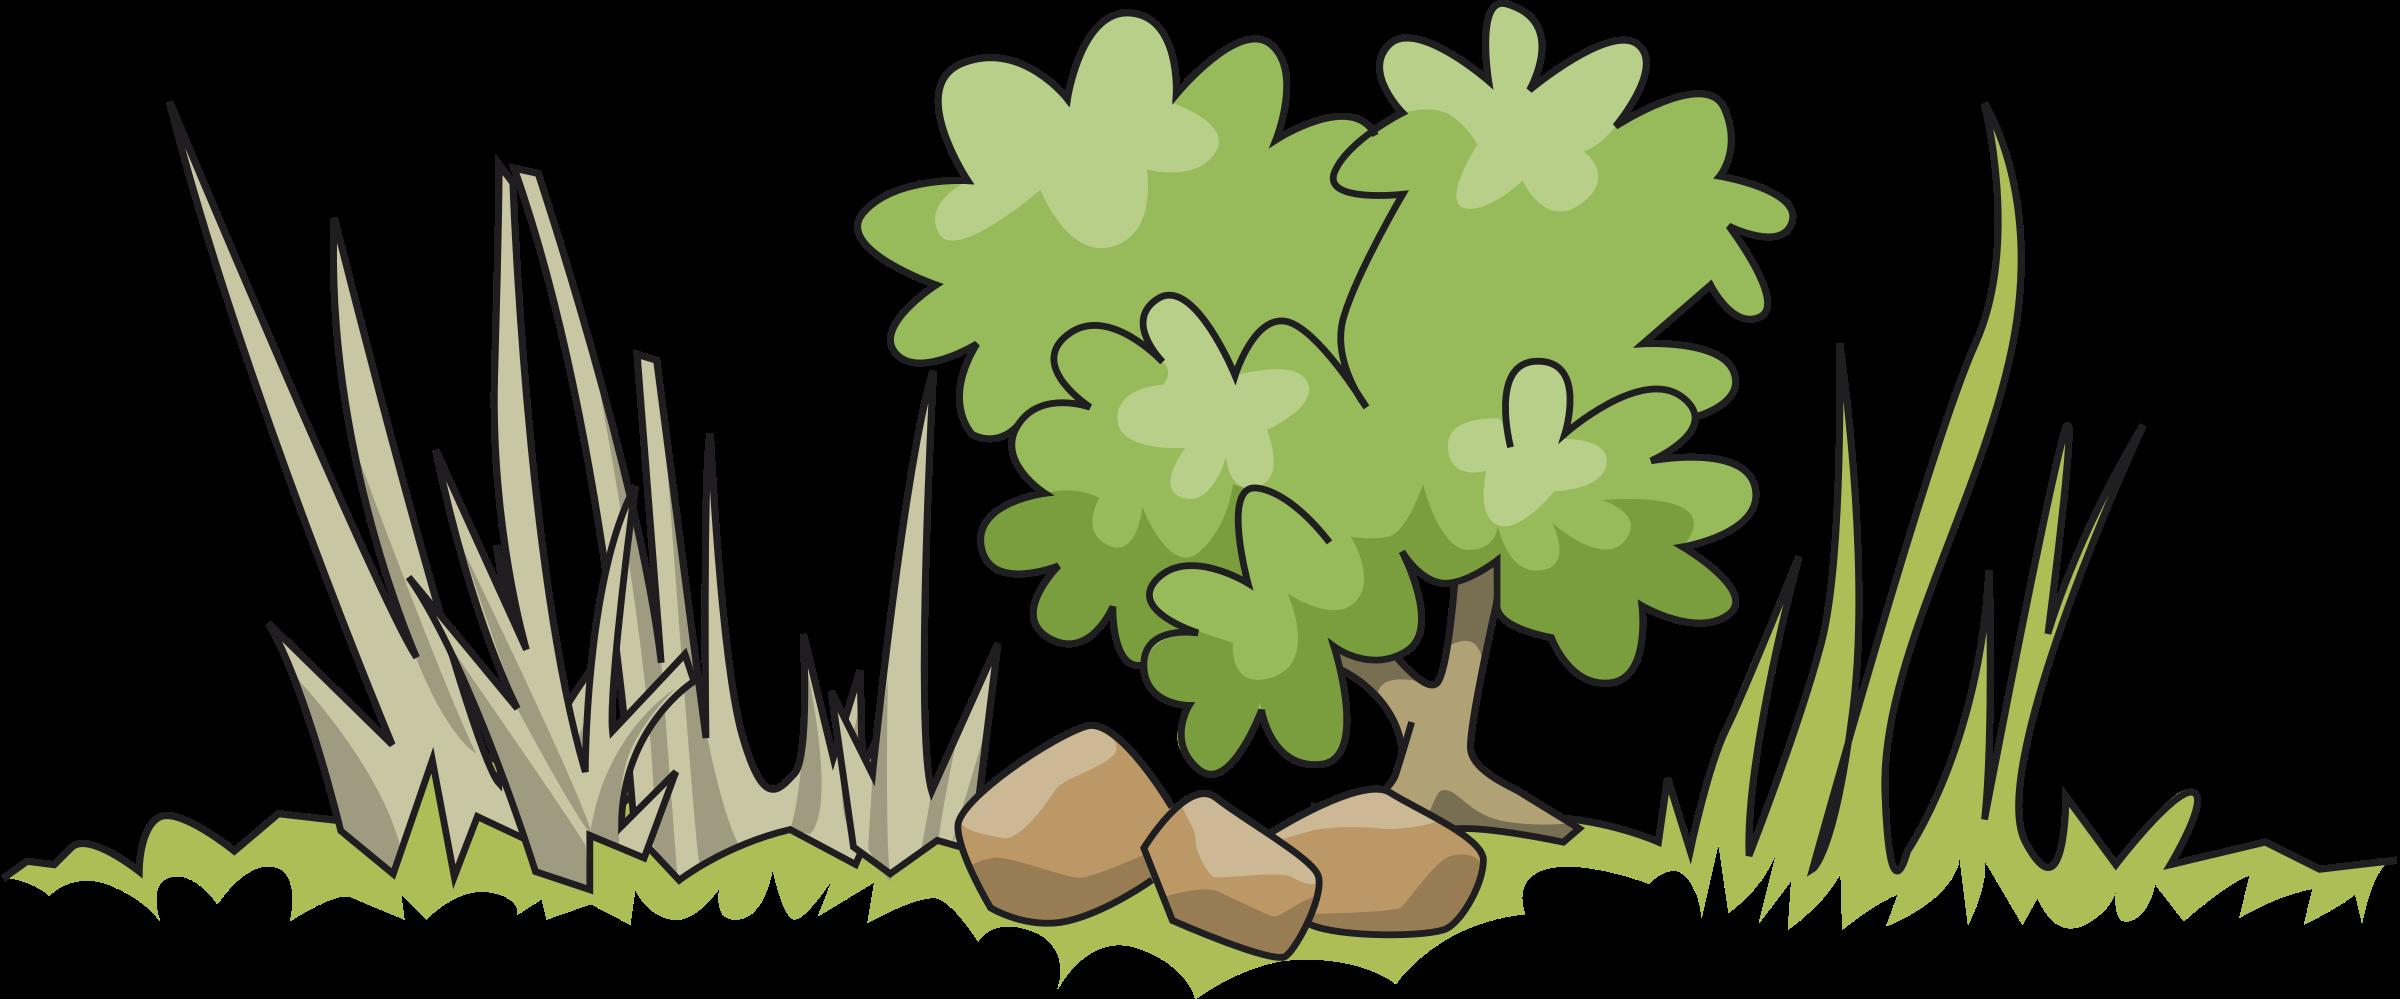 Free Tree Bush Cliparts, Download Free Clip Art, Free Clip.